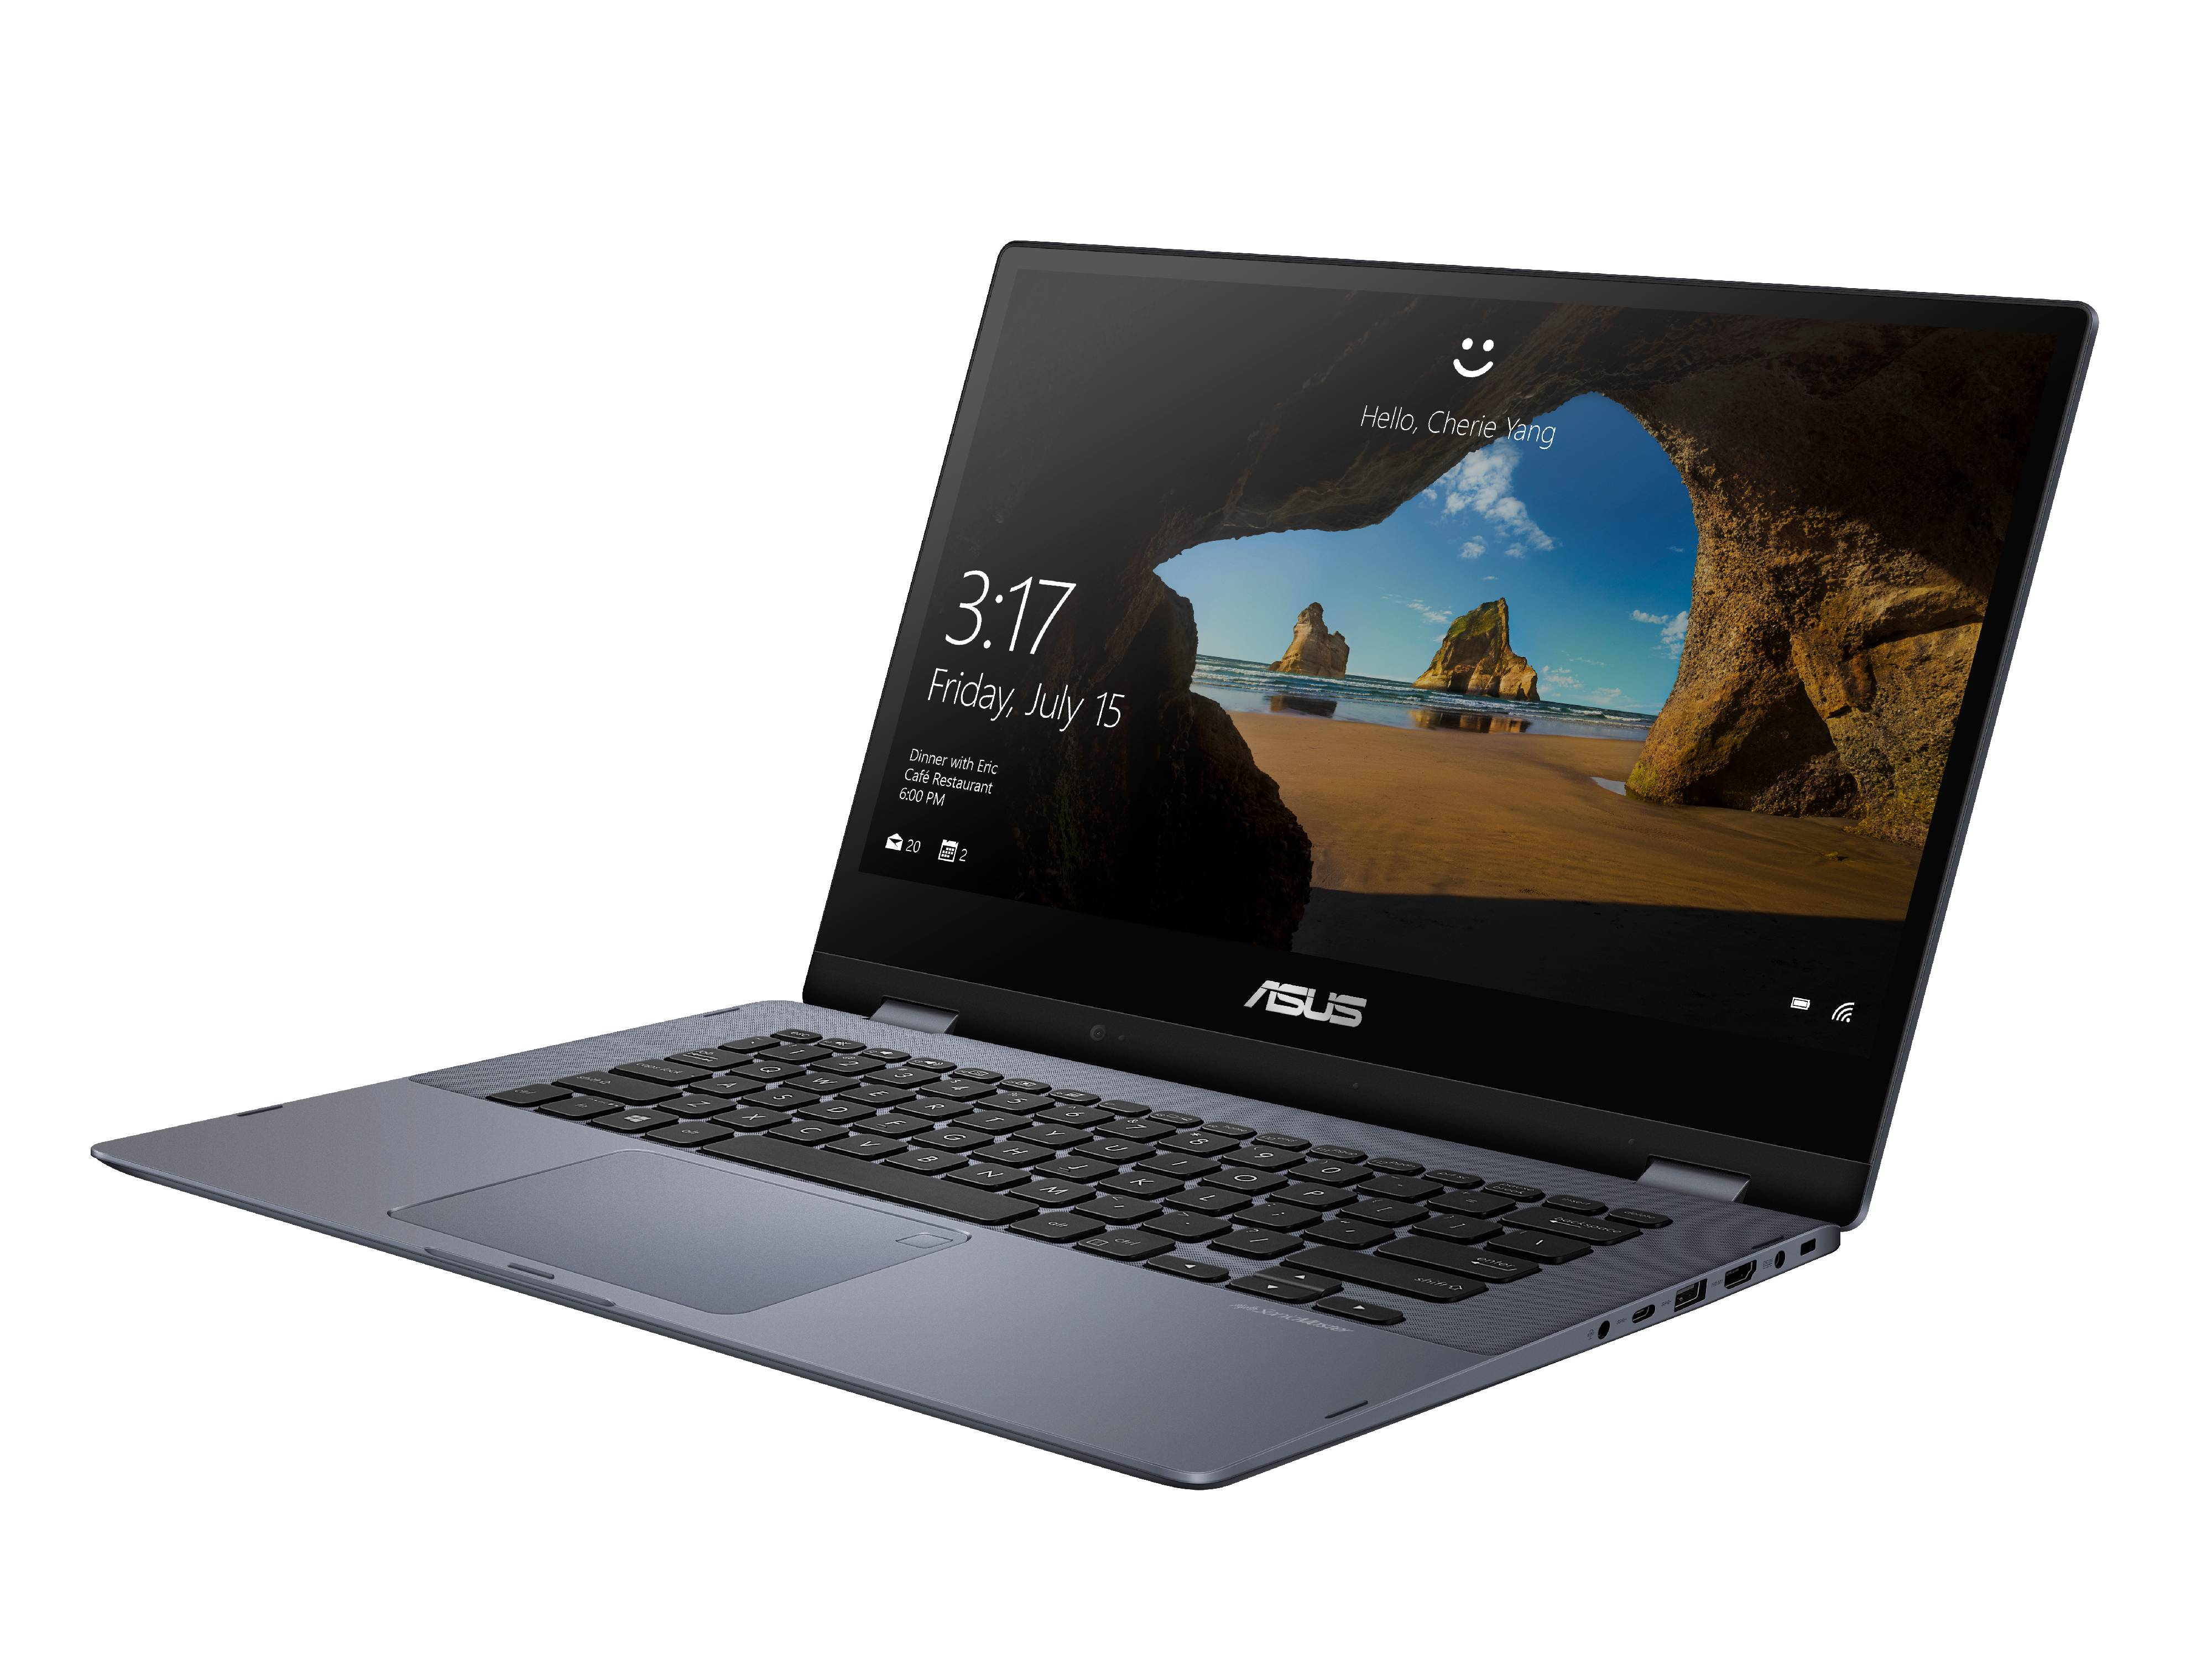 ASUS VivoBook Flip 14 Thin and Lightweight 2-in-1 Full HD